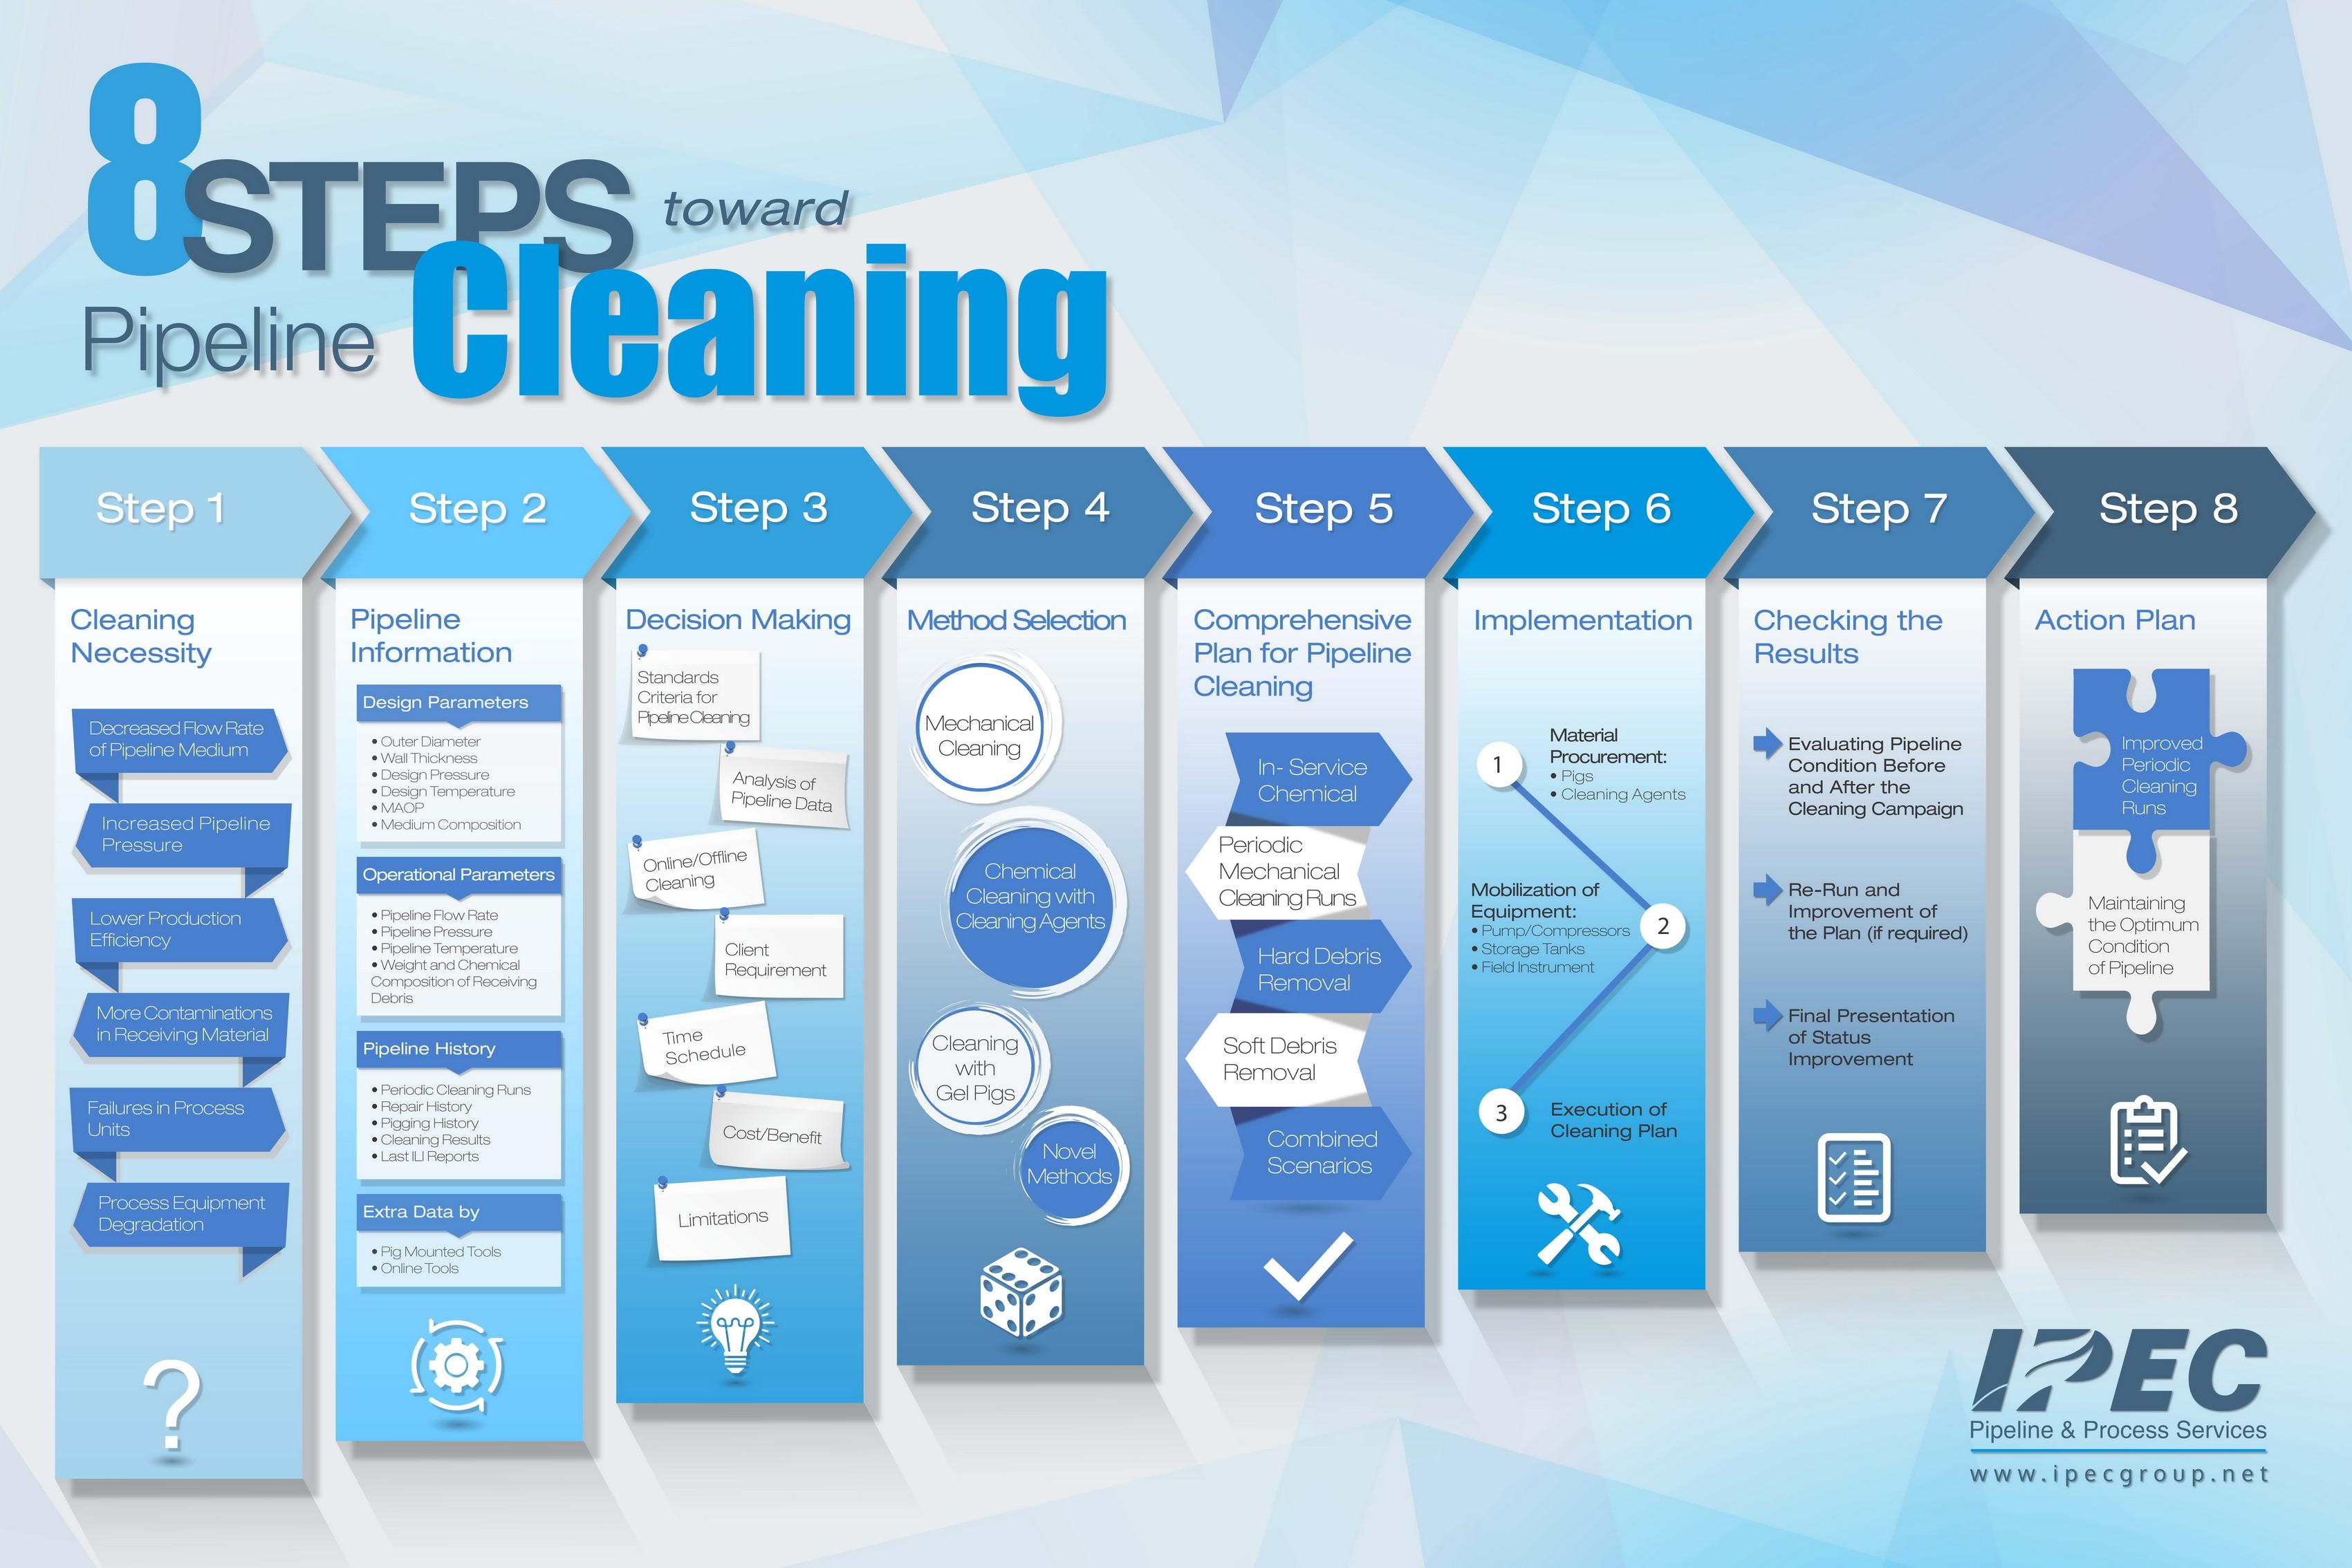 IPEC - Pipeline & Process Services